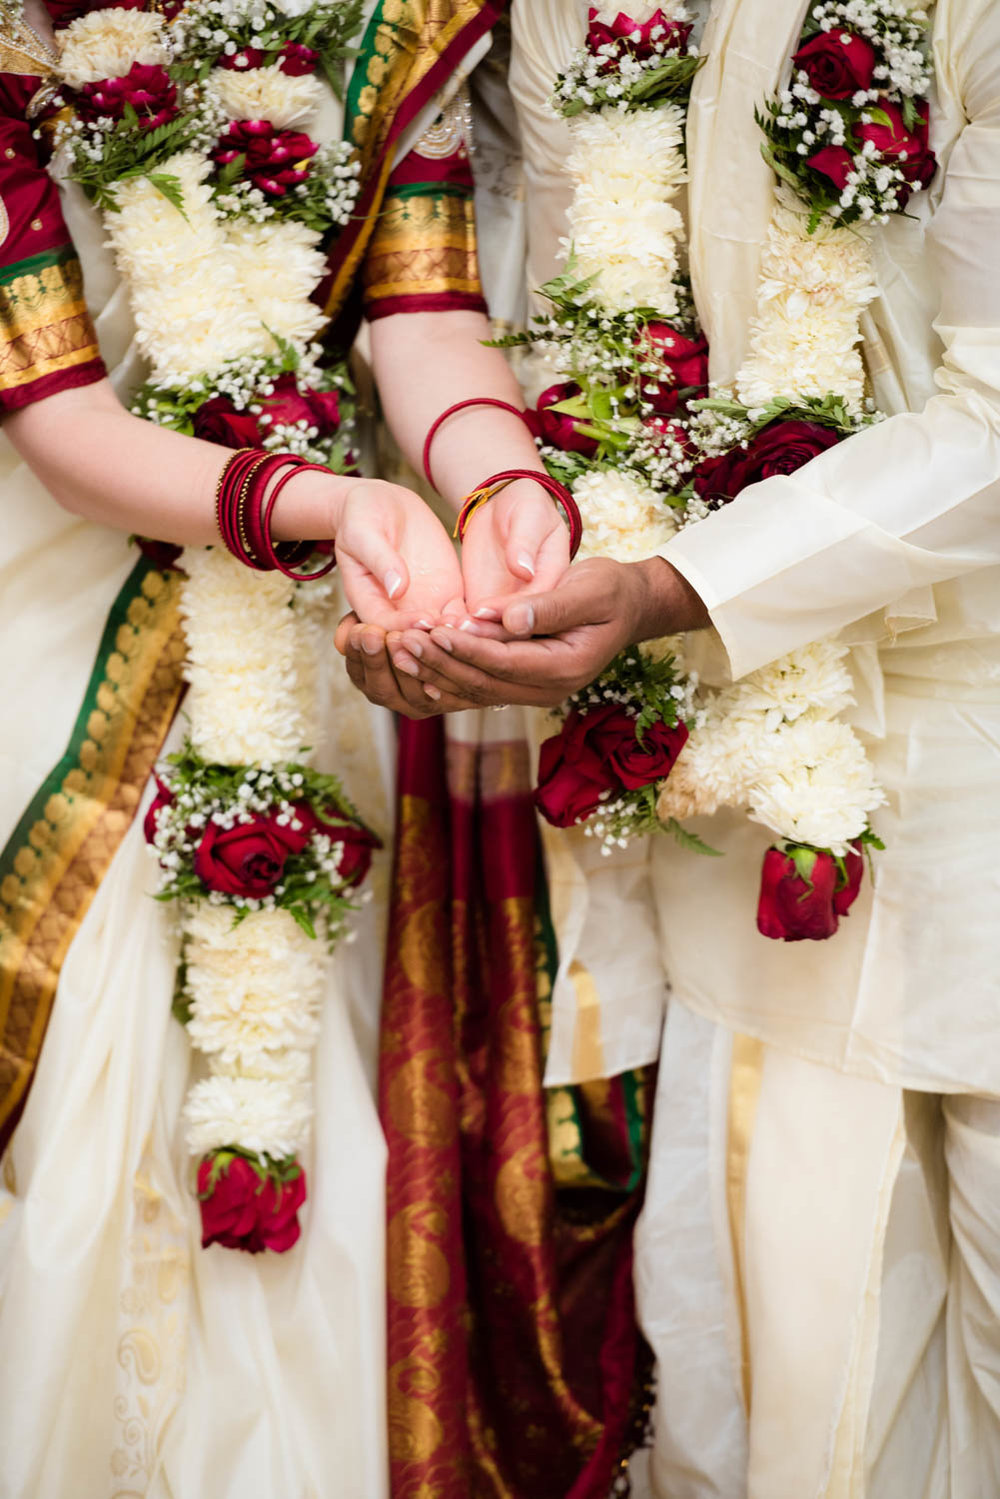 ecaterina-chandu-indian-wedding26.jpg